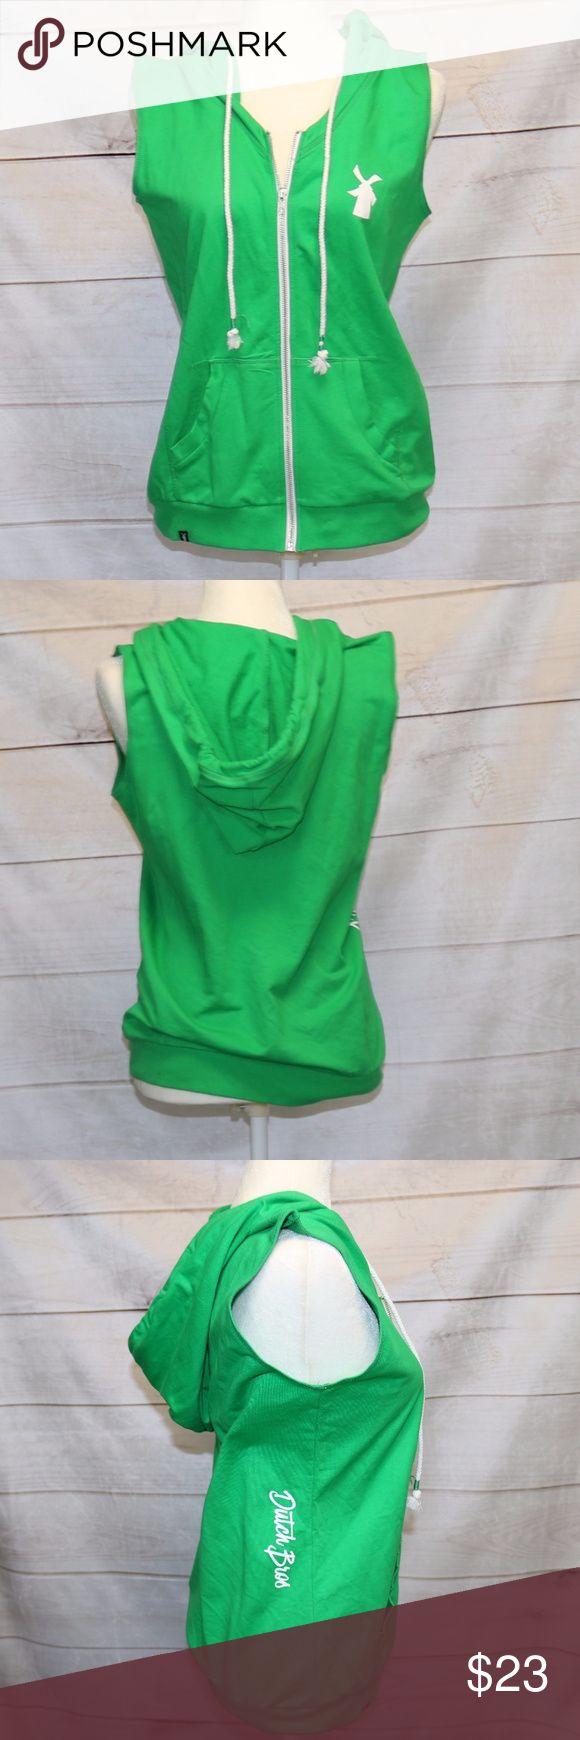 Dutch Bros Green Zip up Sweatshirt Vest - M EUC Medium Dutch Bros Kelly Green perfect for st. patricks day! Zip up front sweatshirt vest with hood Bros Dutch Tops Sweatshirts & Hoodies